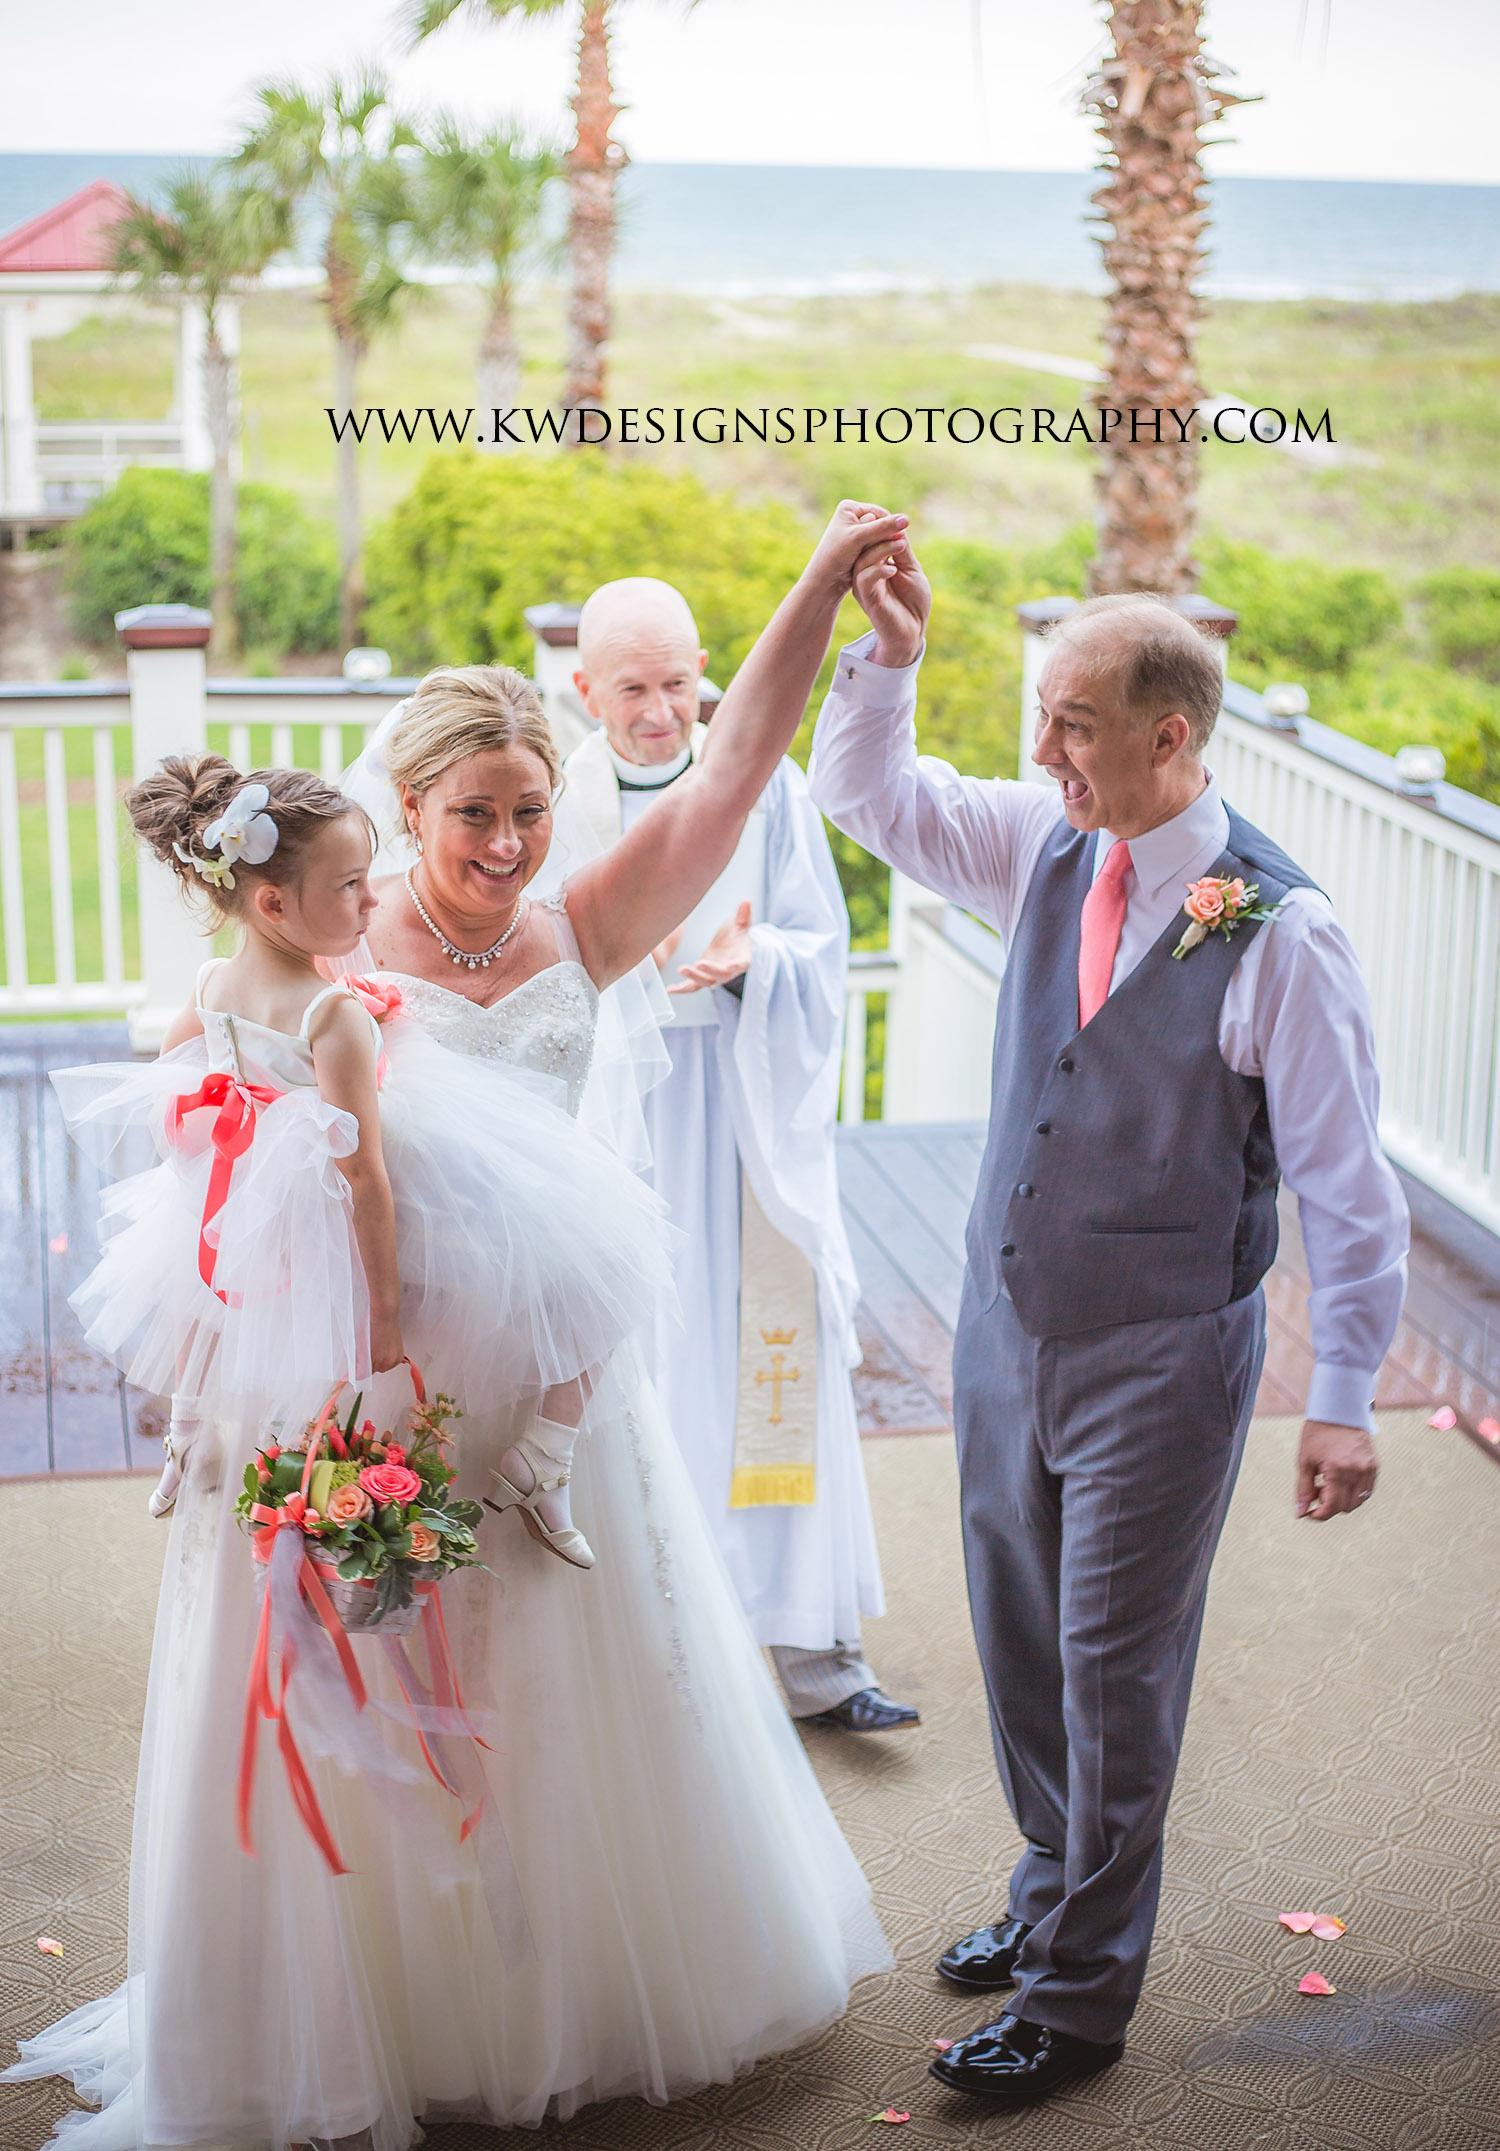 Lakewood Colorado Wedding Photographer - Travel Beach Wedding Photographer